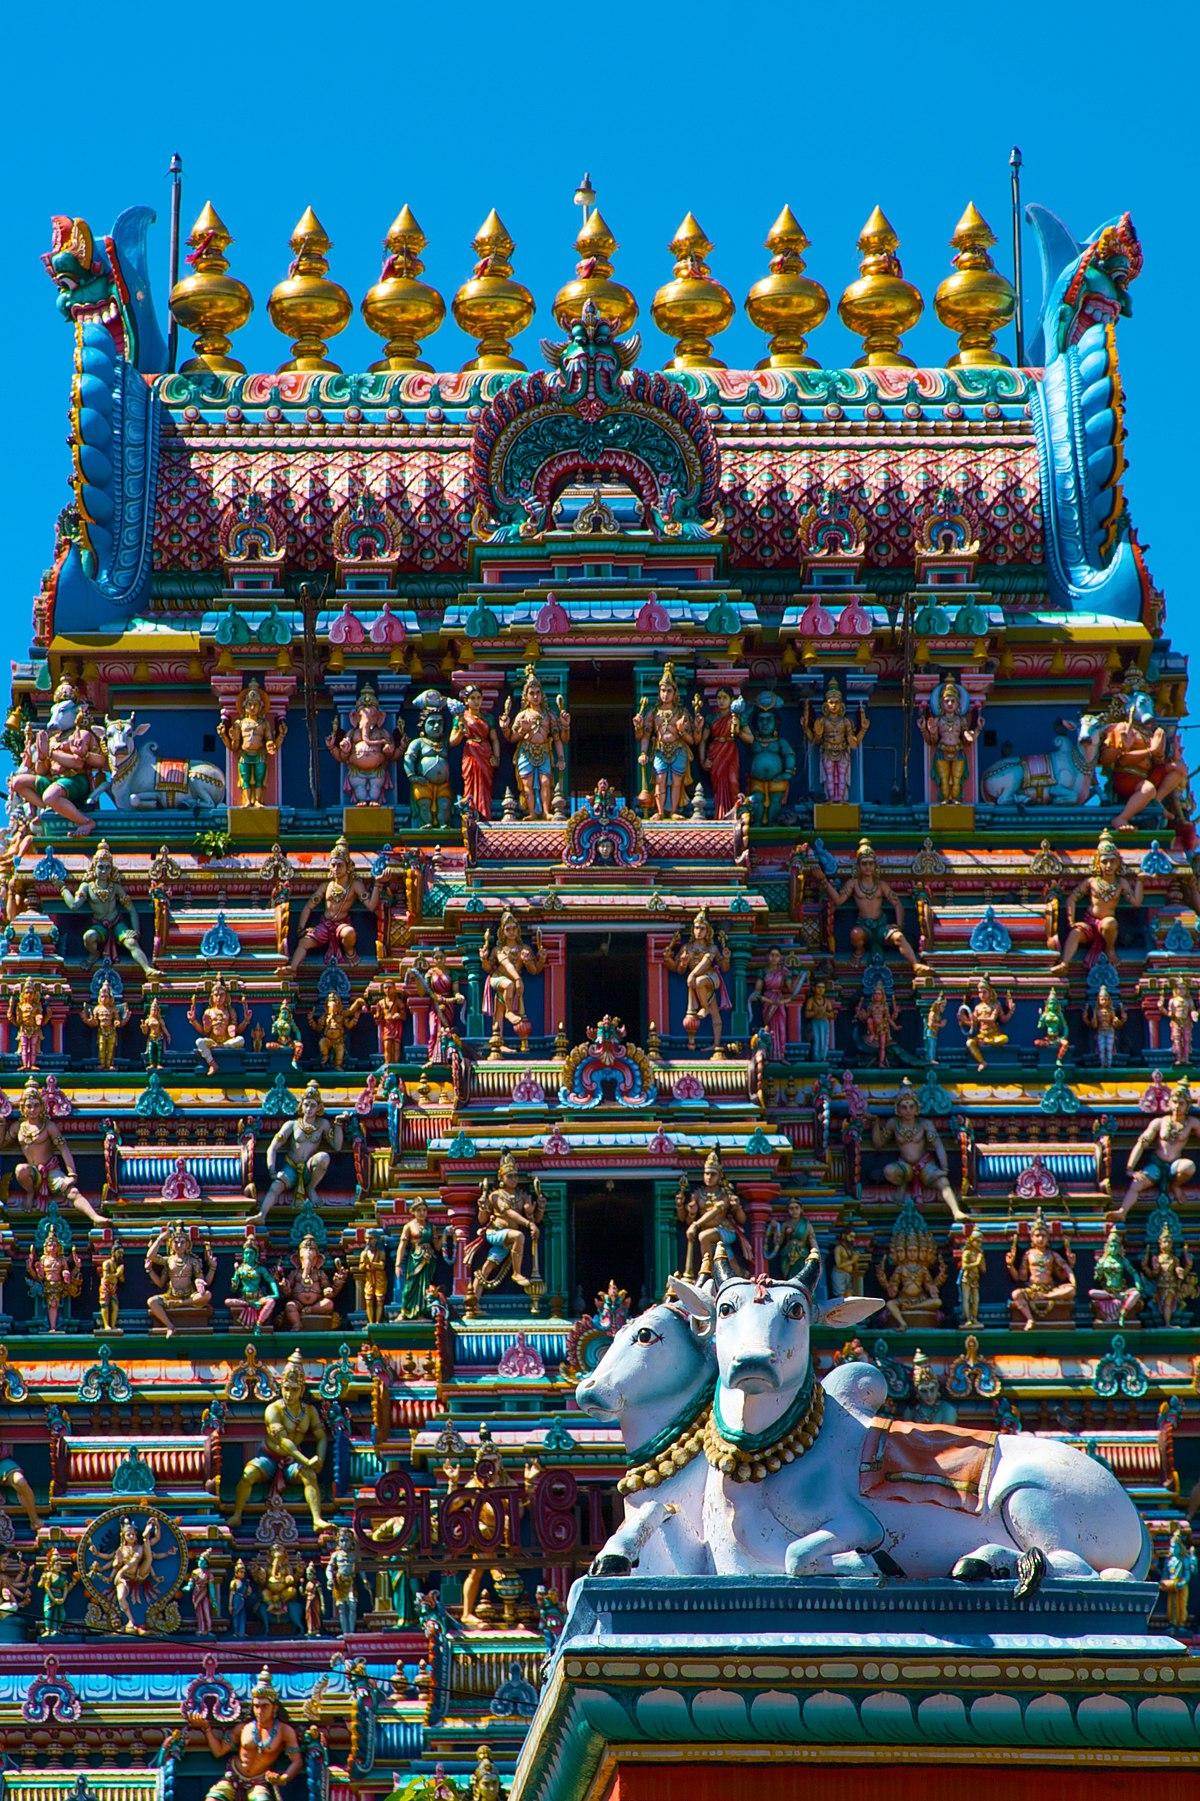 temple india culture kapaleeshwarar wikipedia chennai temples cows hindu animal husbandry cow depicted decorated wiki kapaleeswarar gopuram wikimedia south